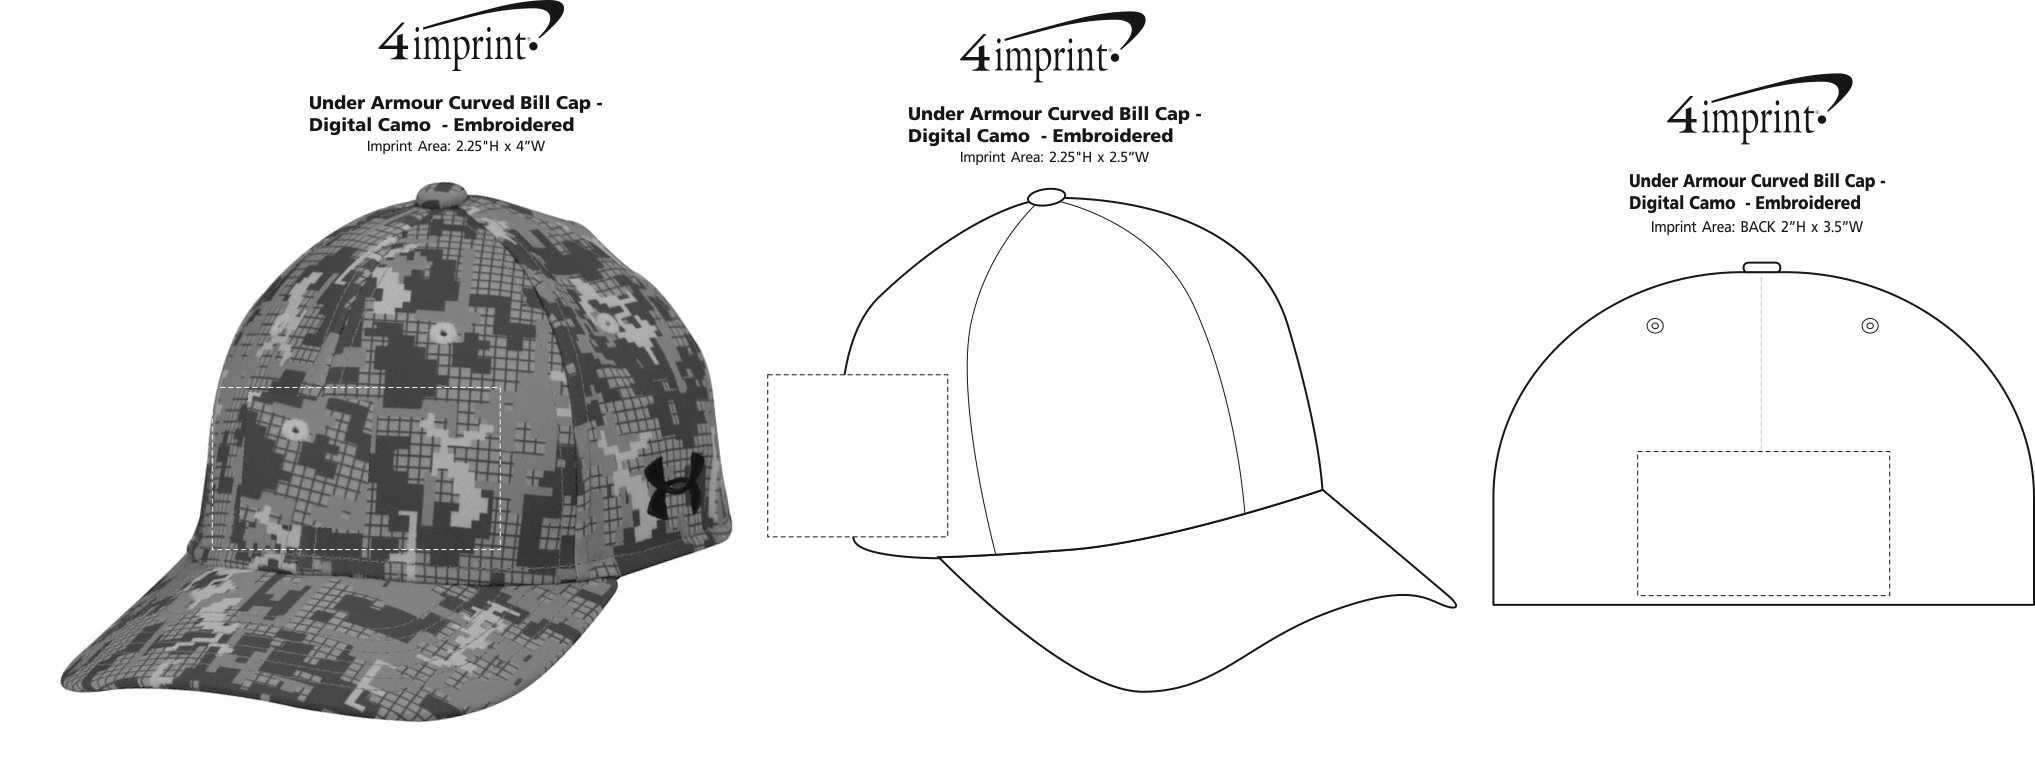 f52fba9cc78 ... Under Armour Curved Bill Cap - Digital Camo -. View Imprint